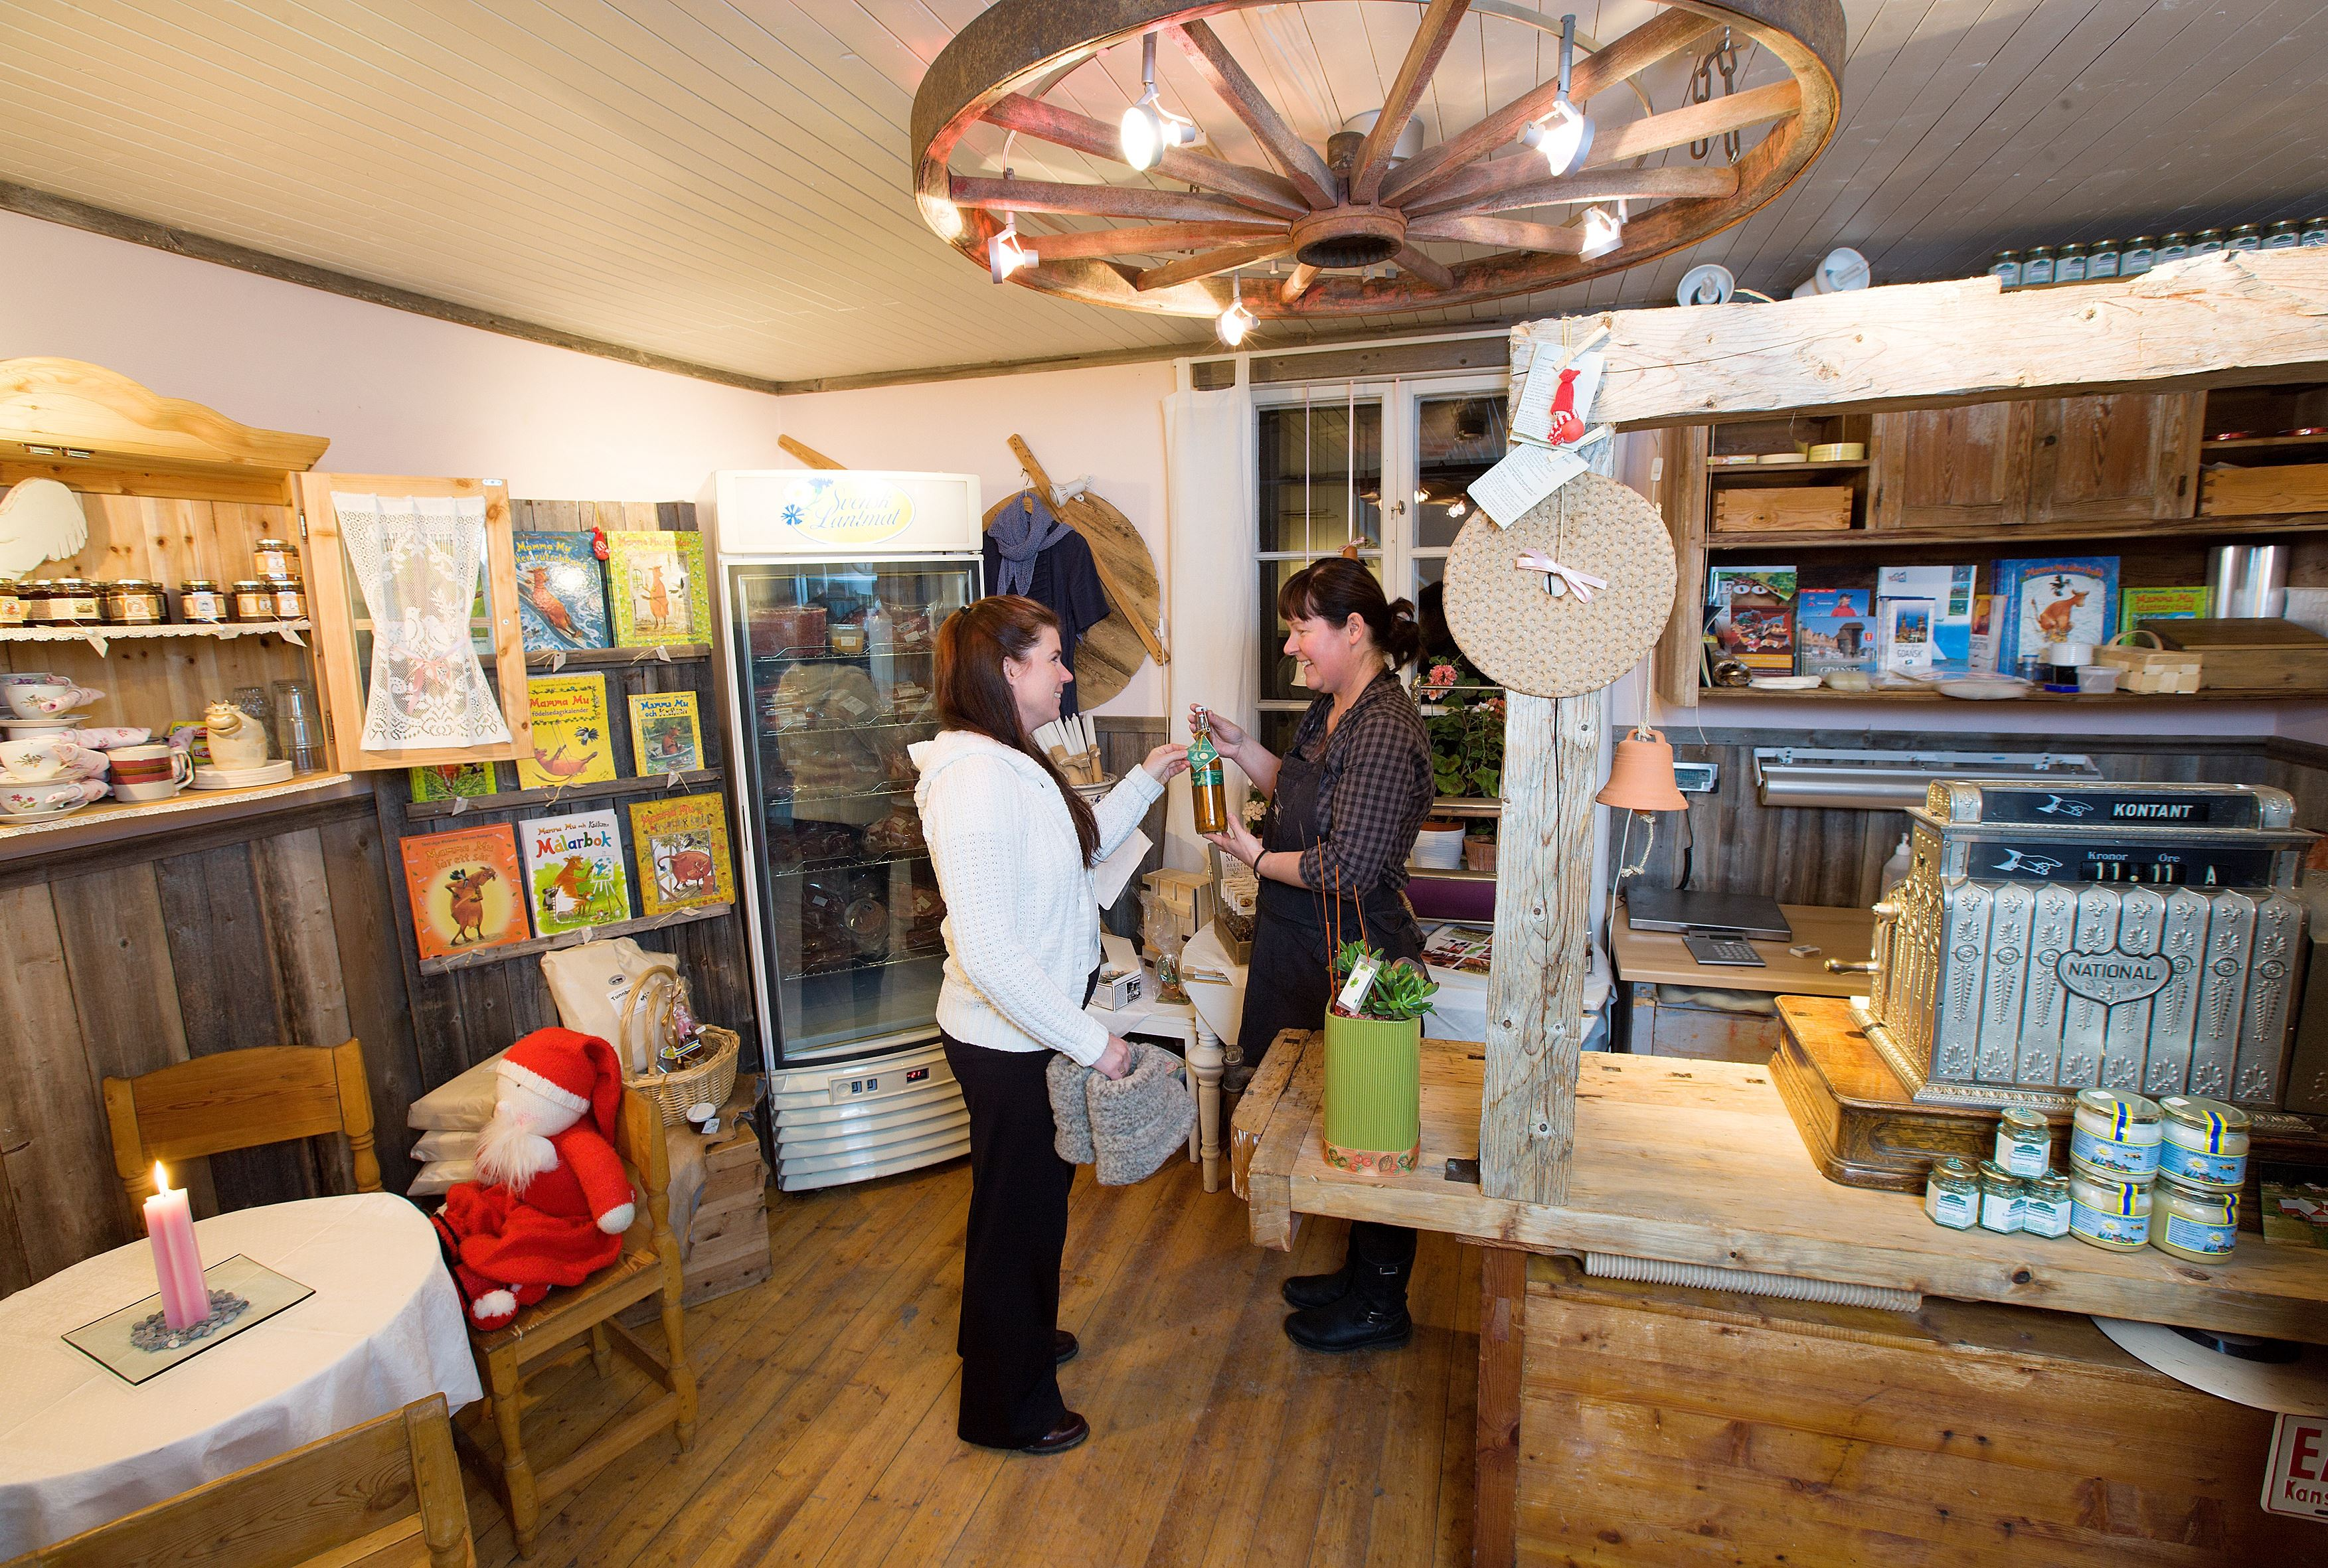 Åbrånet's farm shop & café